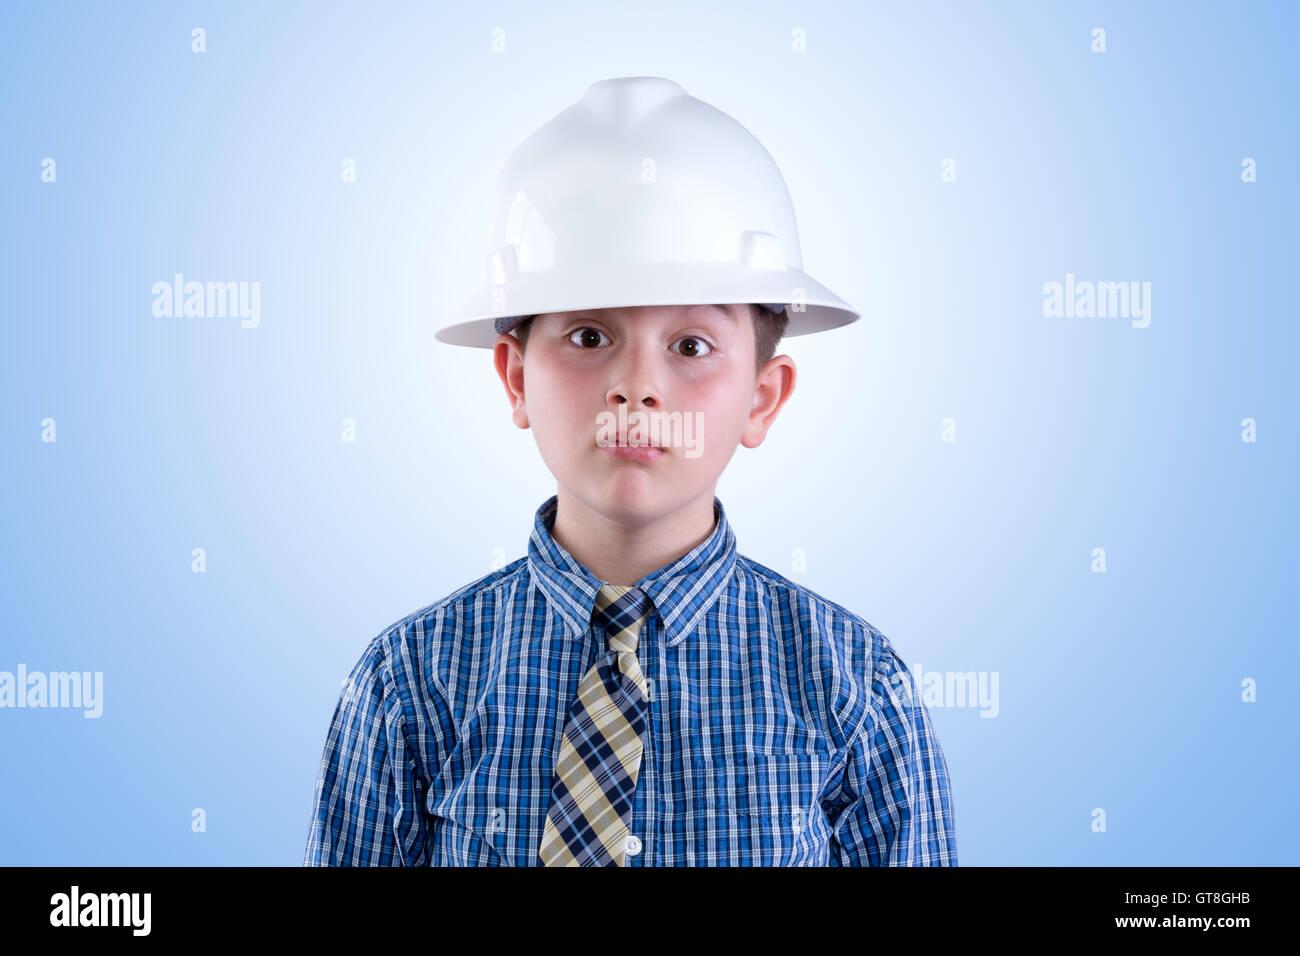 my dream career on becoming an engineer